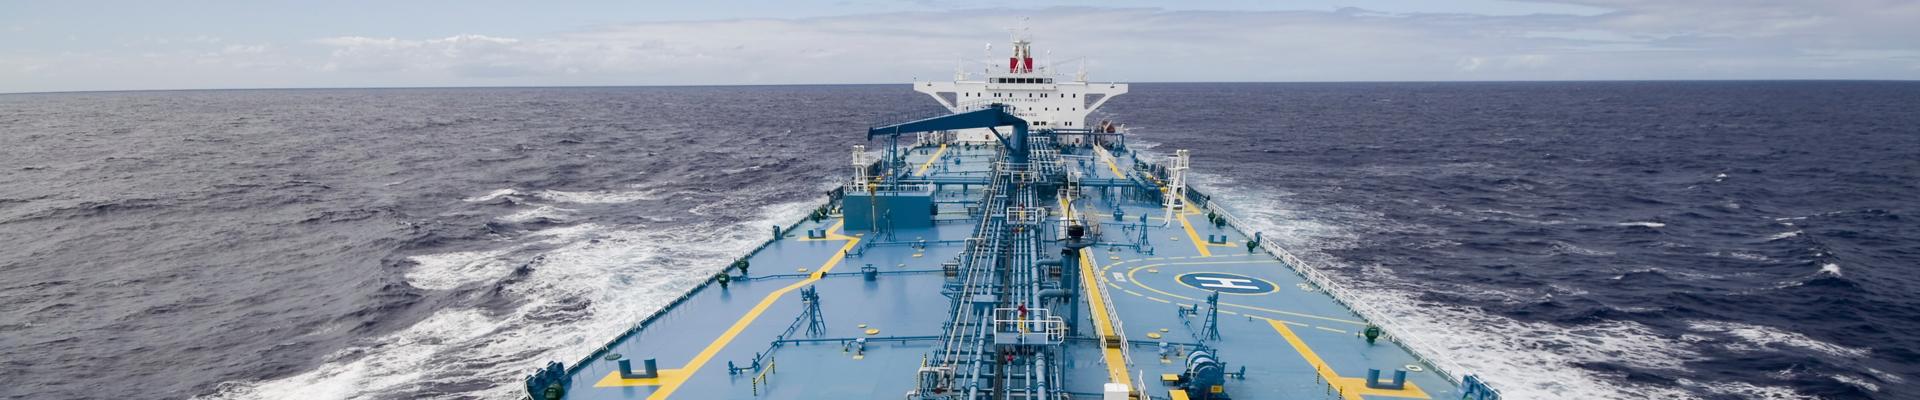 delitek-big-ship